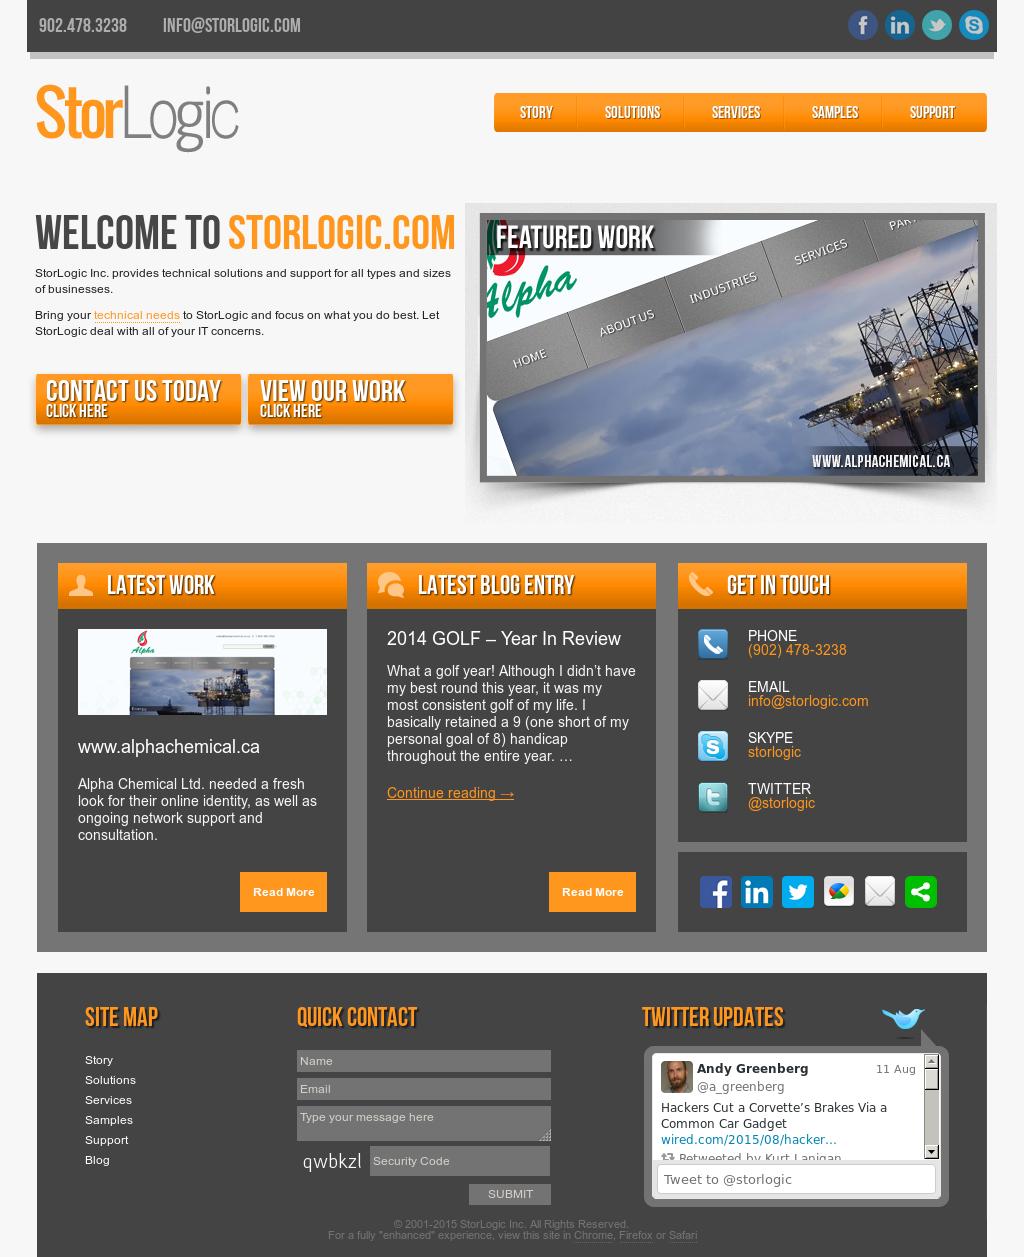 Storlogic Competitors, Revenue and Employees - Owler Company Profile